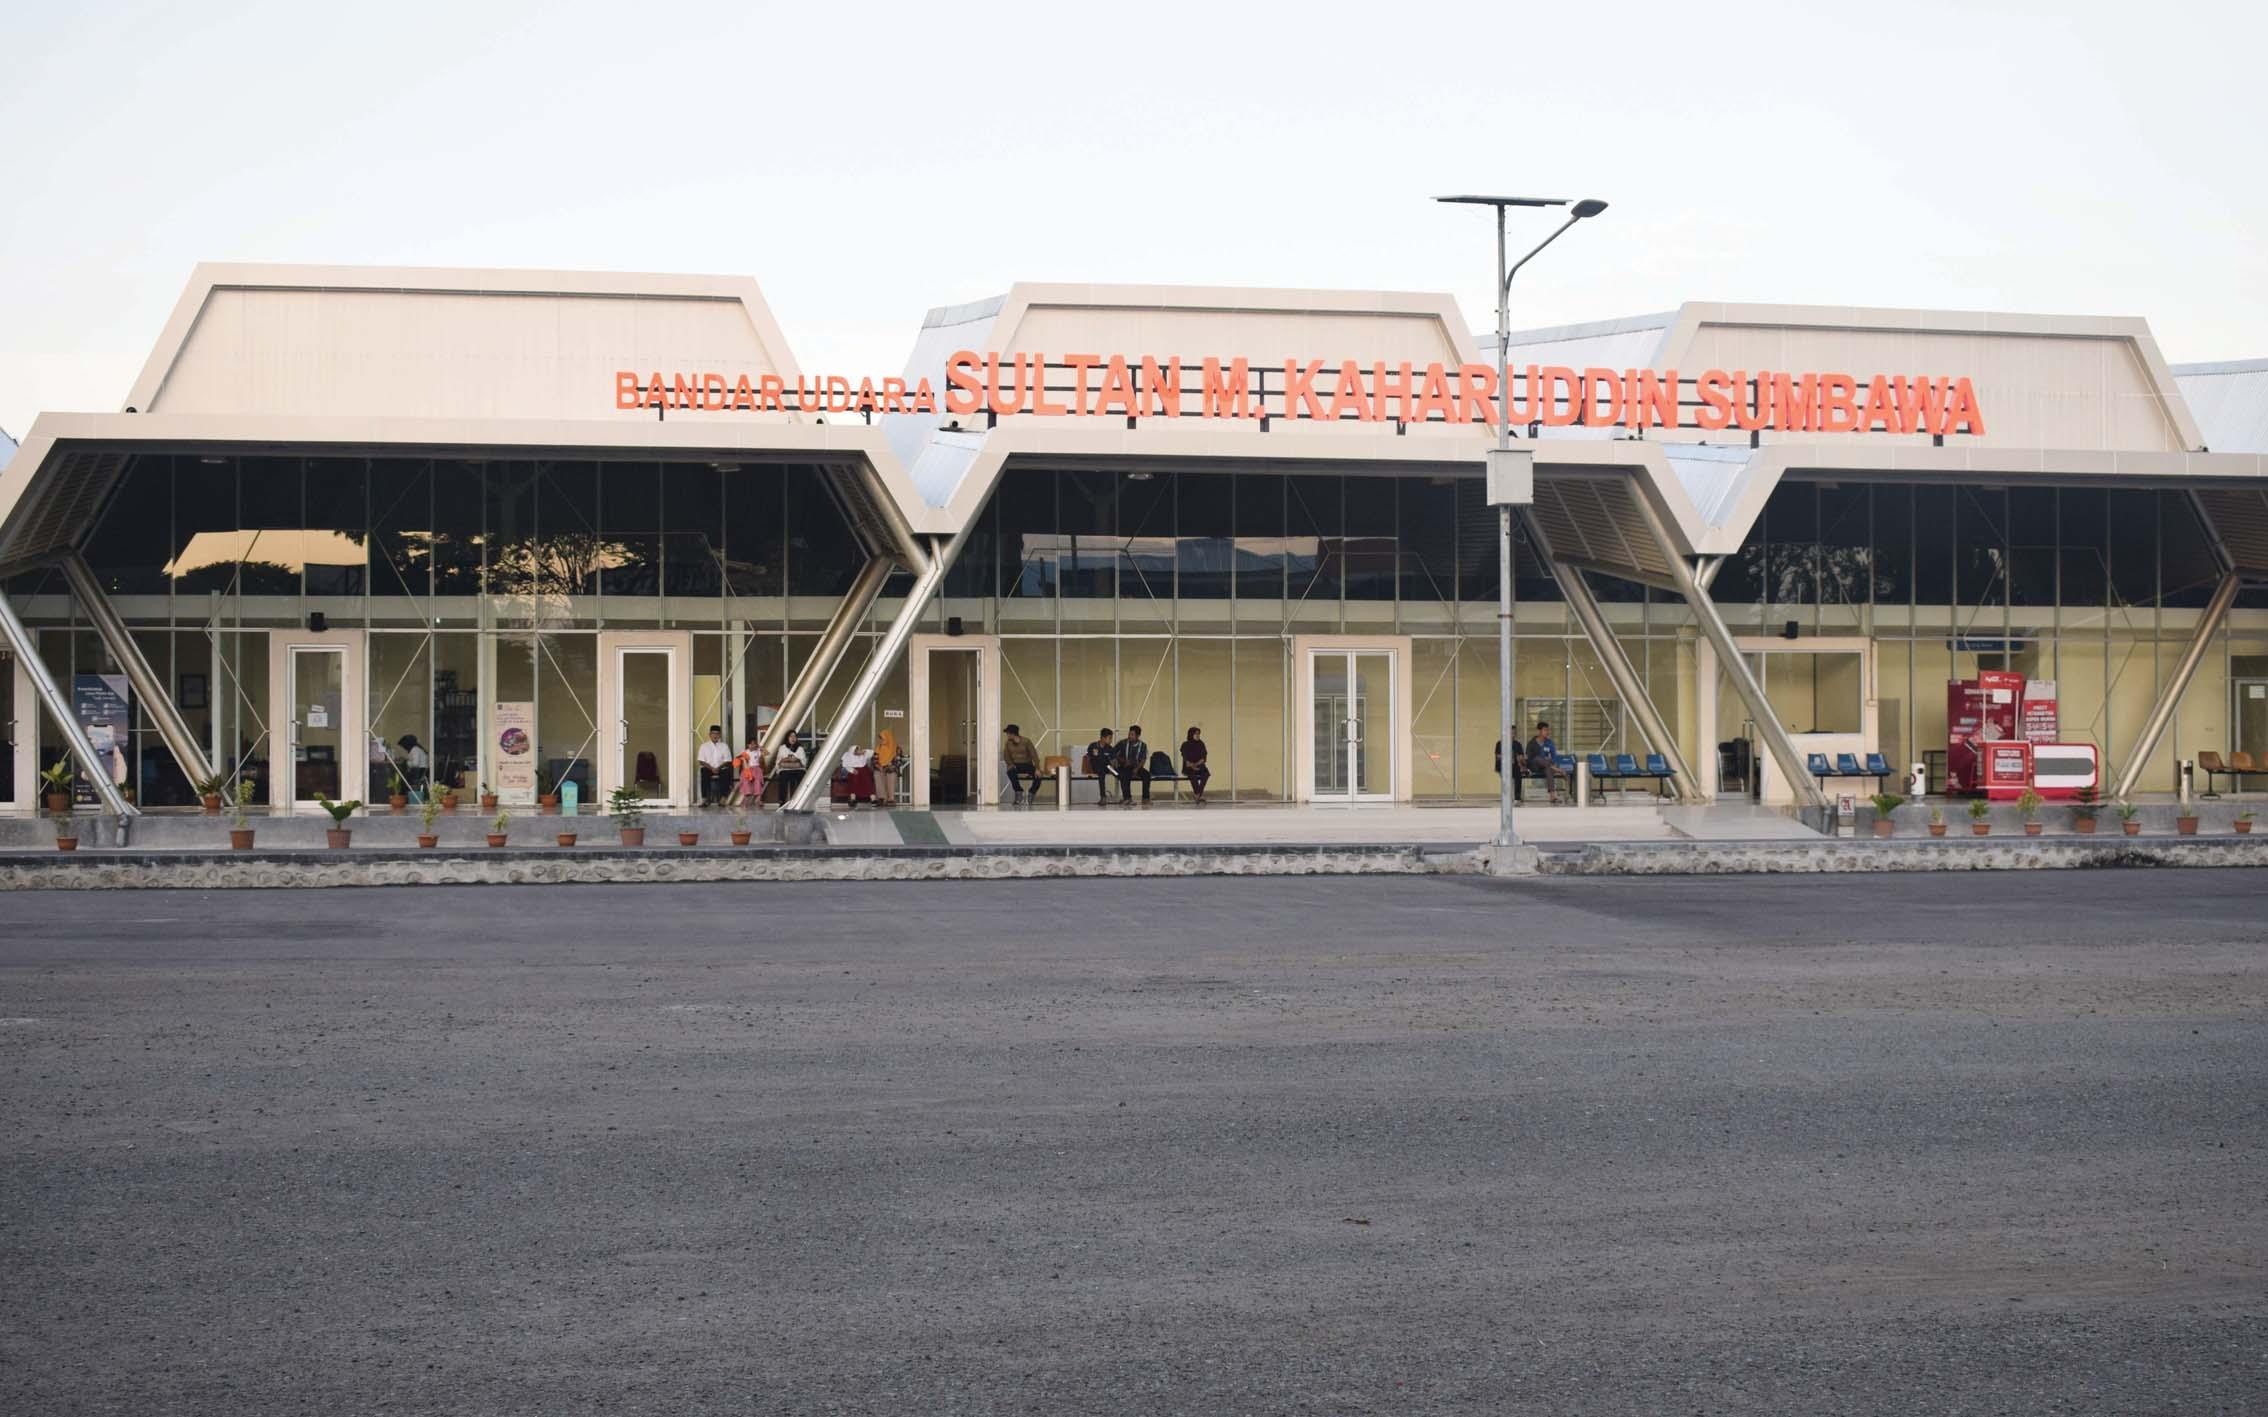 Potret Bandara Sultan Muhammad Kaharuddin | Sumber dok: Majalah Bandara